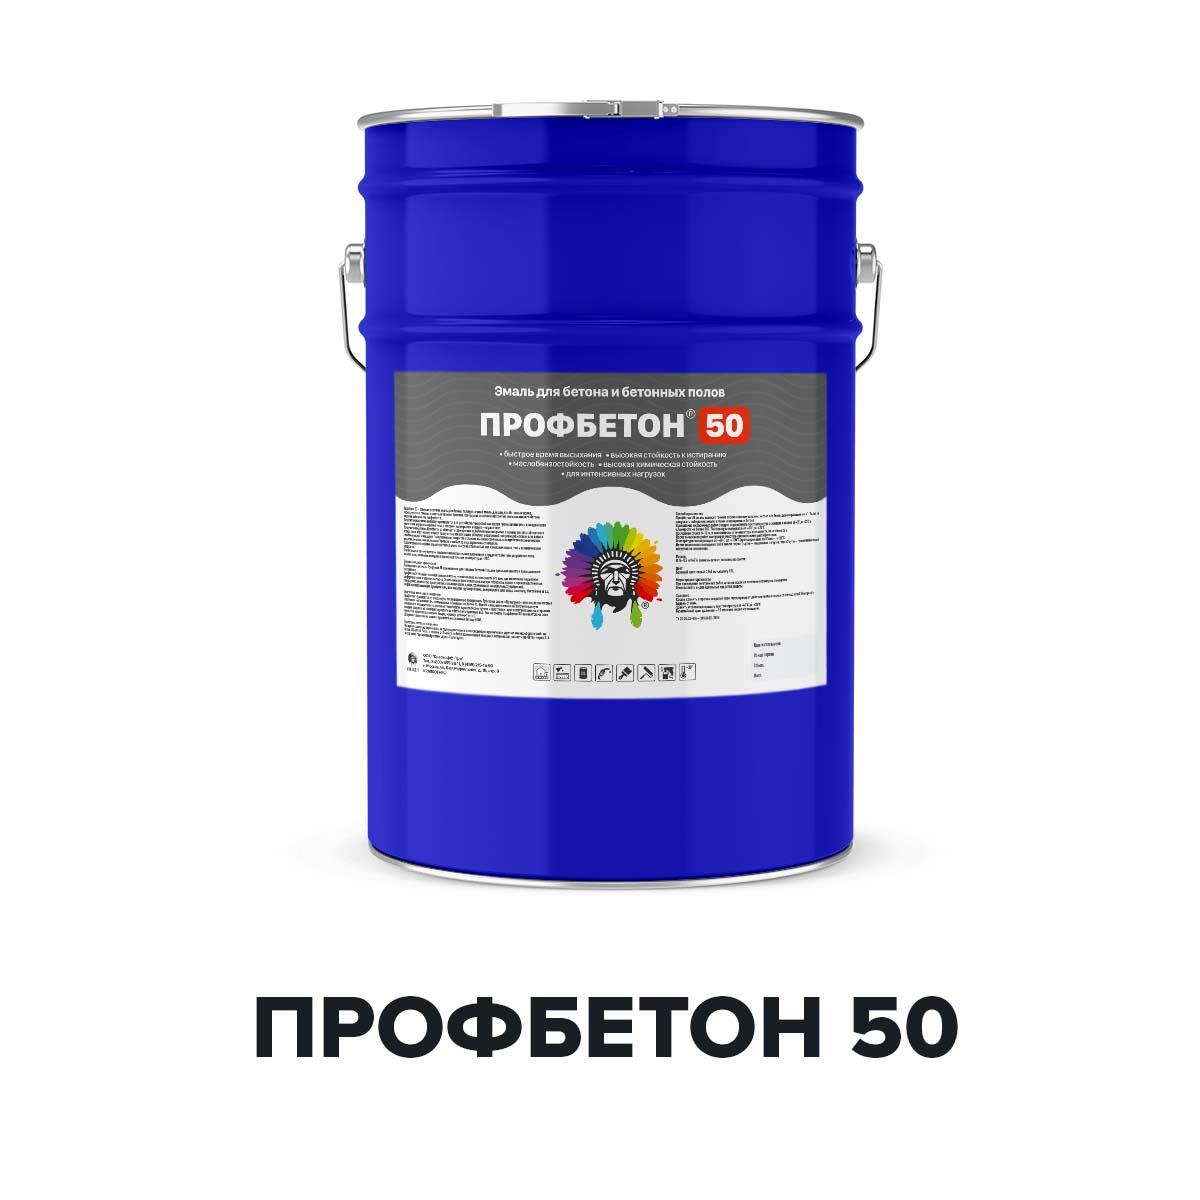 бетона 50